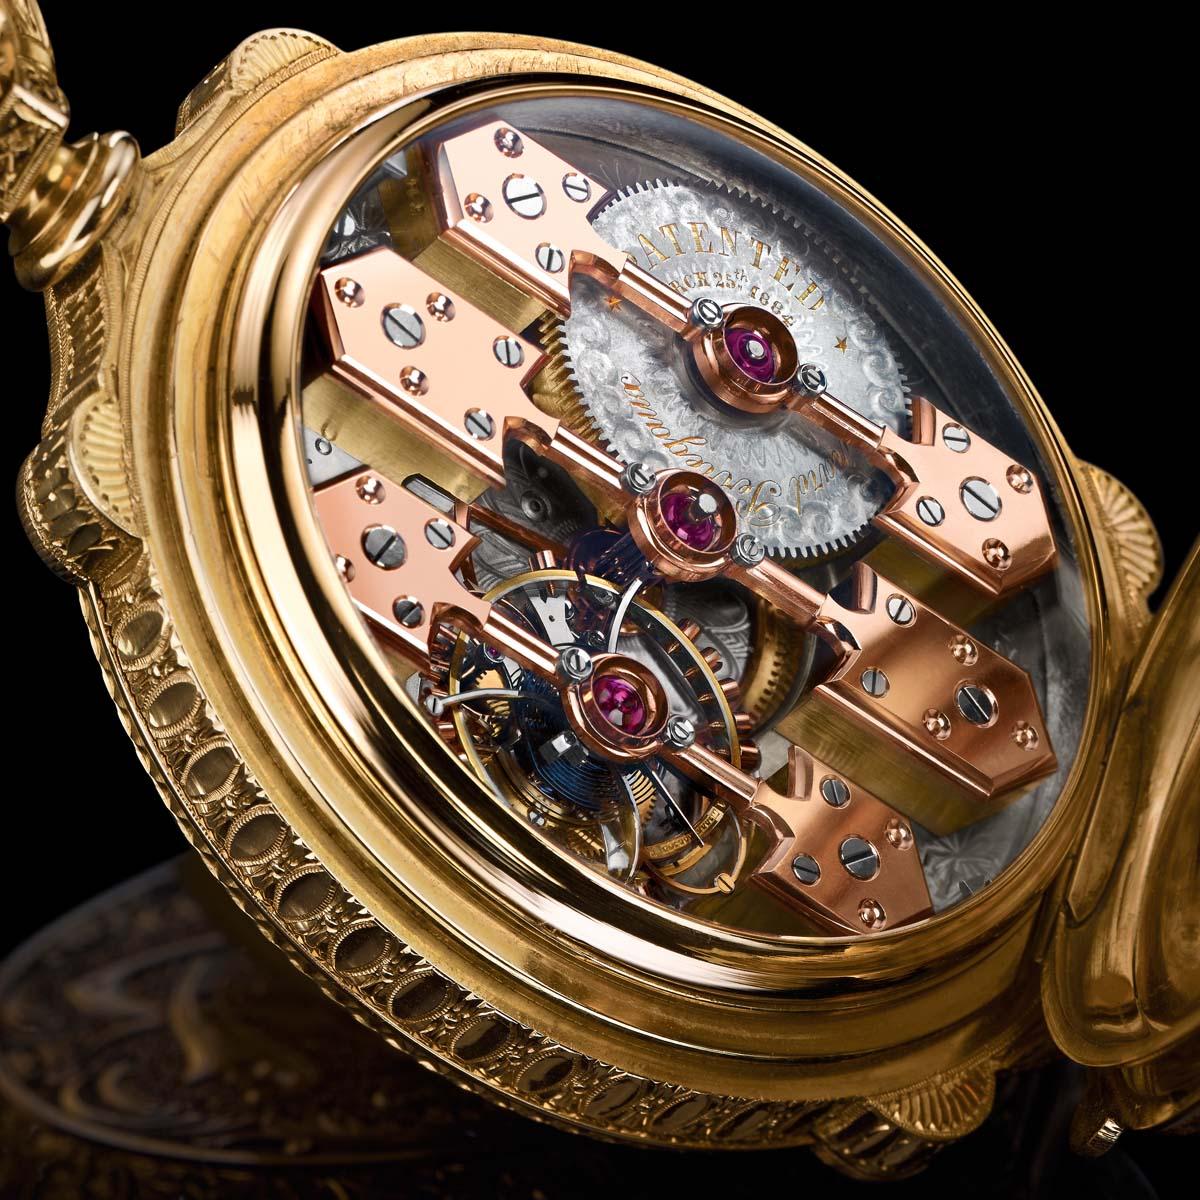 La Cote des Montres : Photo - Girard-Perregaux au SIAR, Salón Internacional Alta Relojería pour la 4e année consécutive